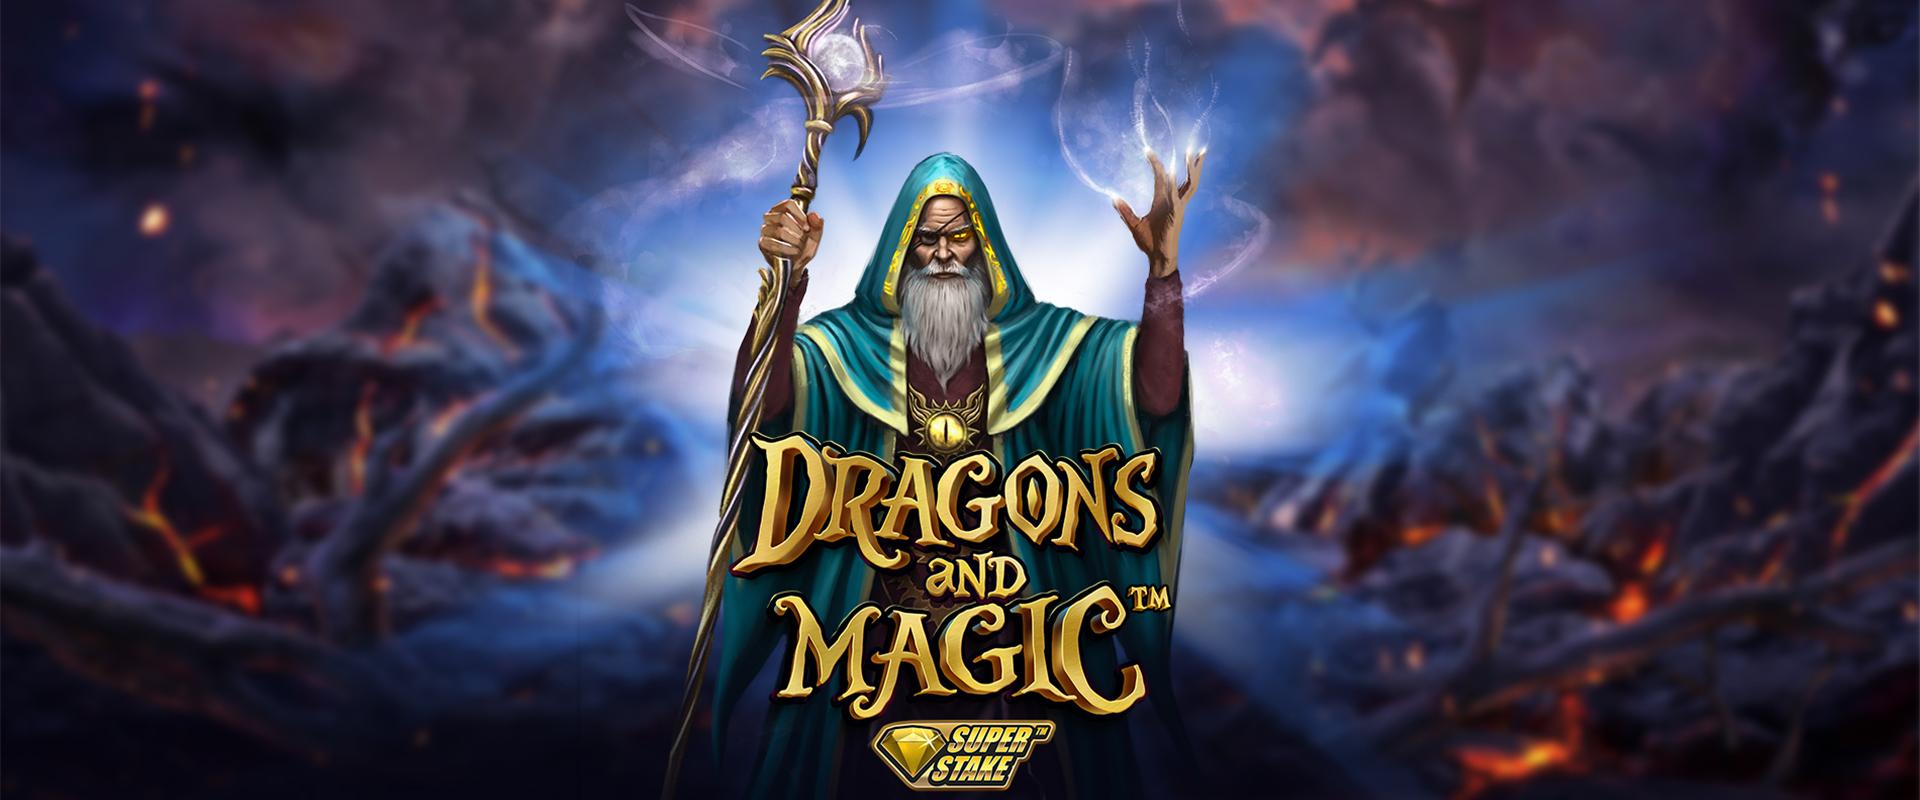 Dragons mystery stake logic casino slots Kızılpınar